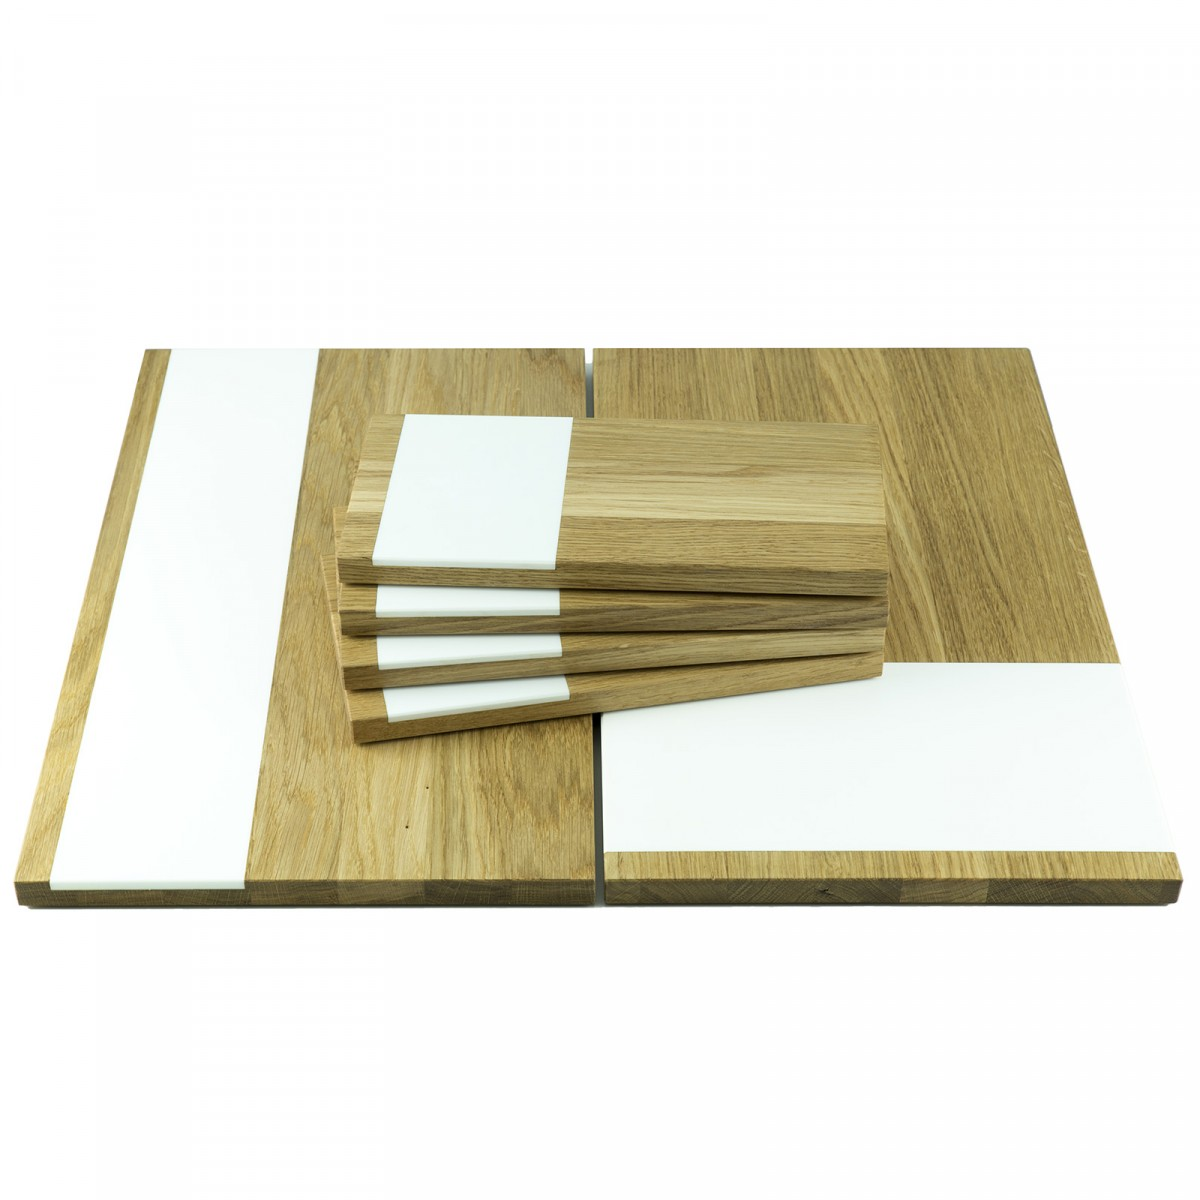 Küchenbrett 6er Set | Servierbrett, Schneidebretter | Holzbutiq